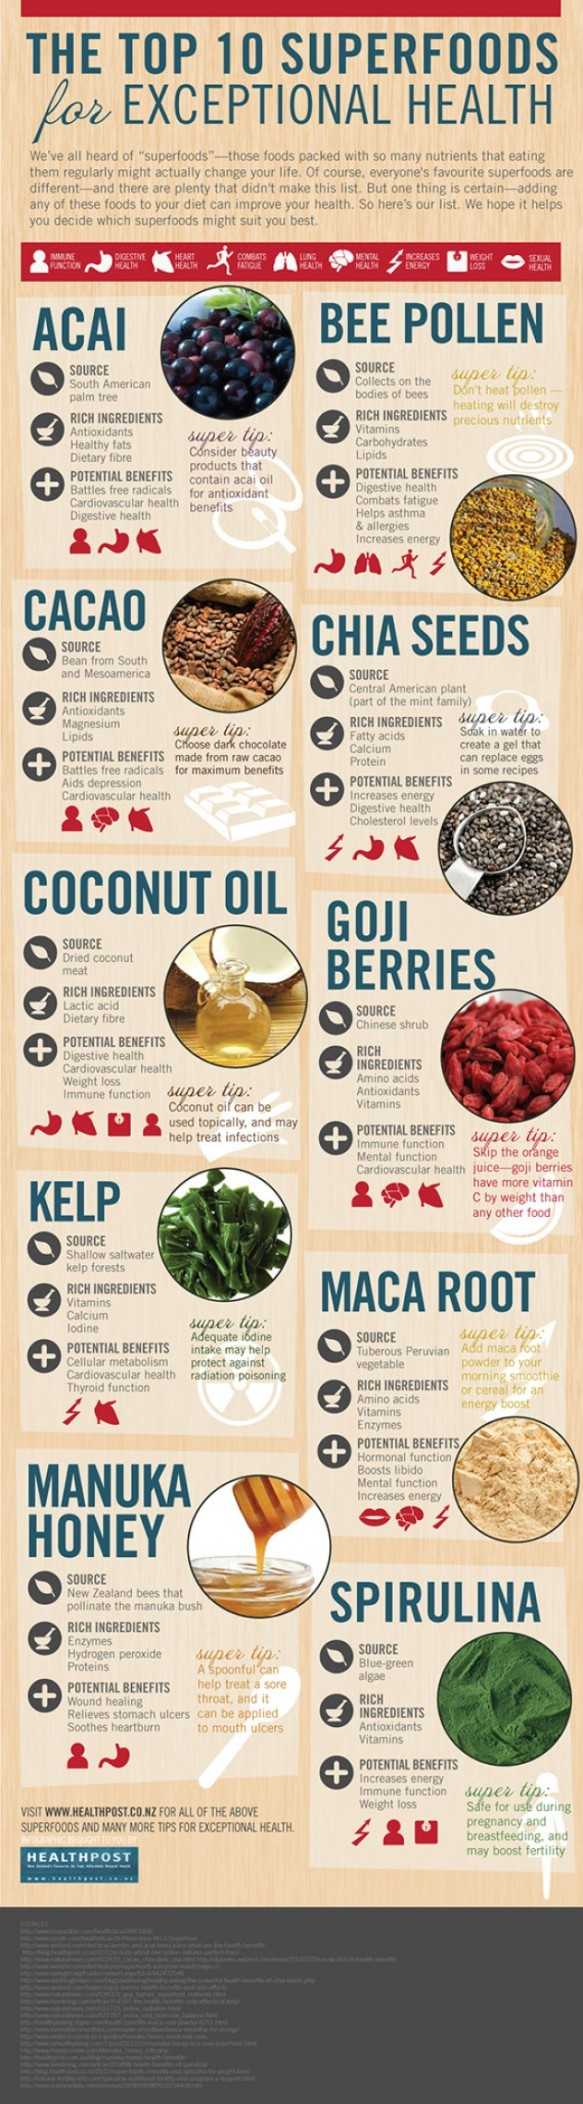 Super Foods Super-foods